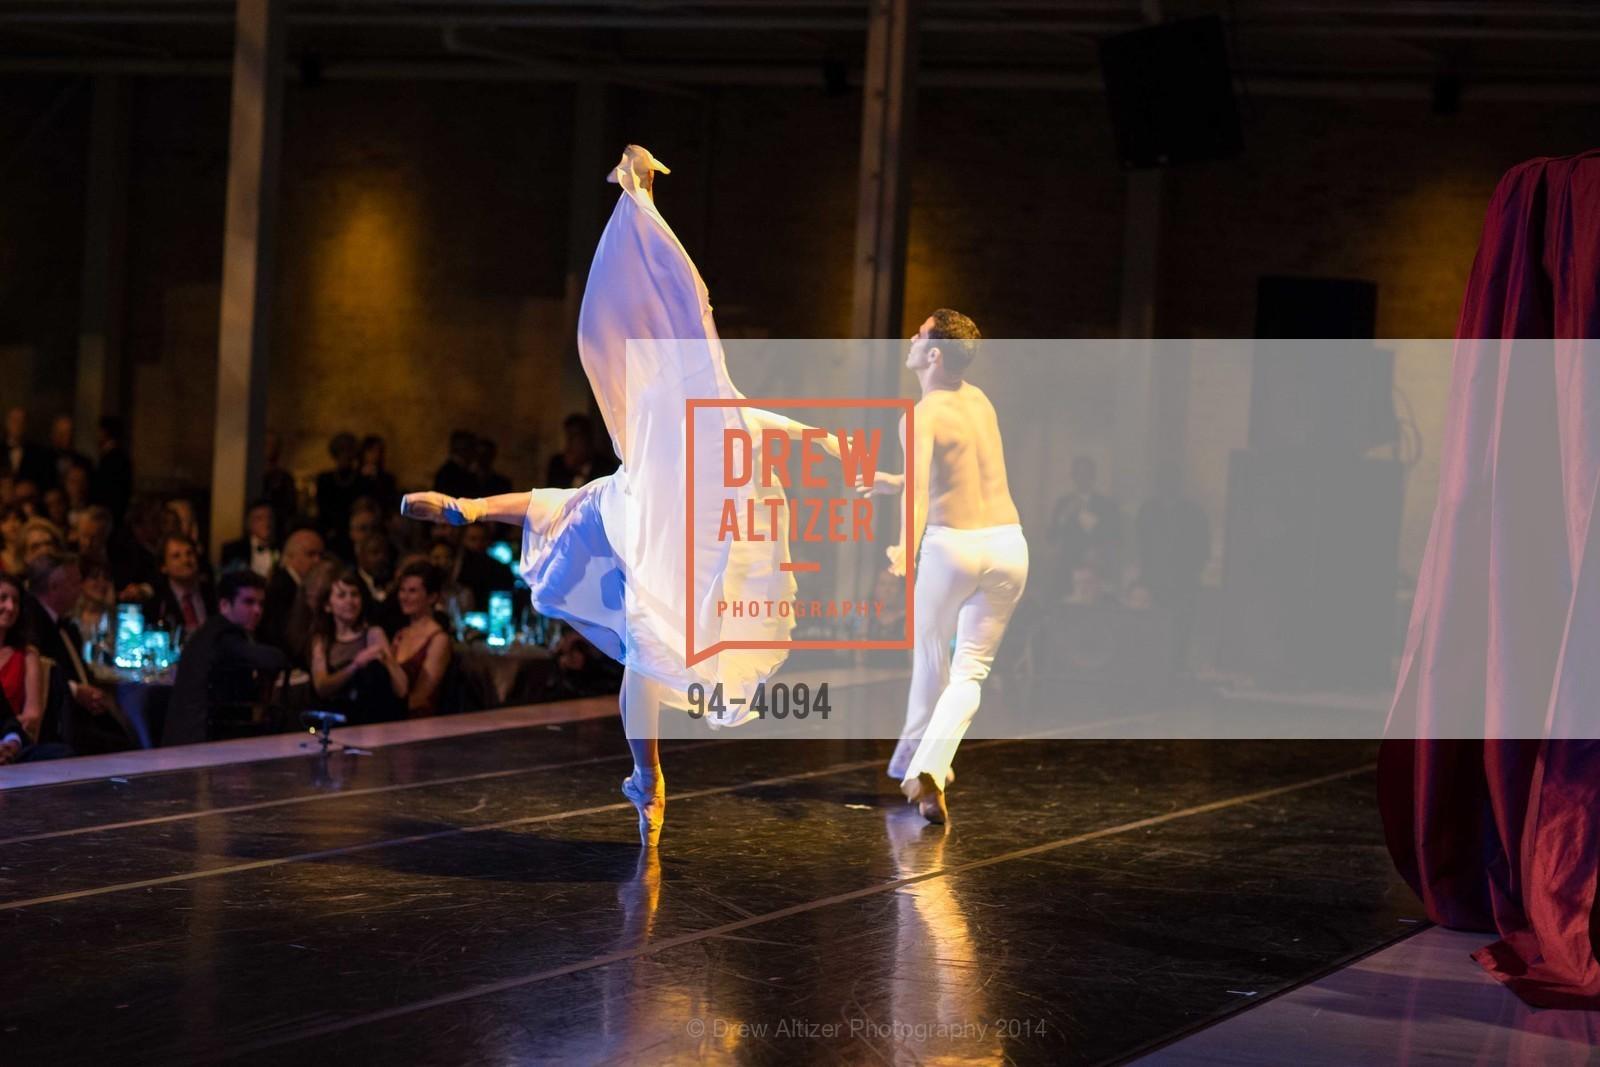 Performance, Photo #94-4094